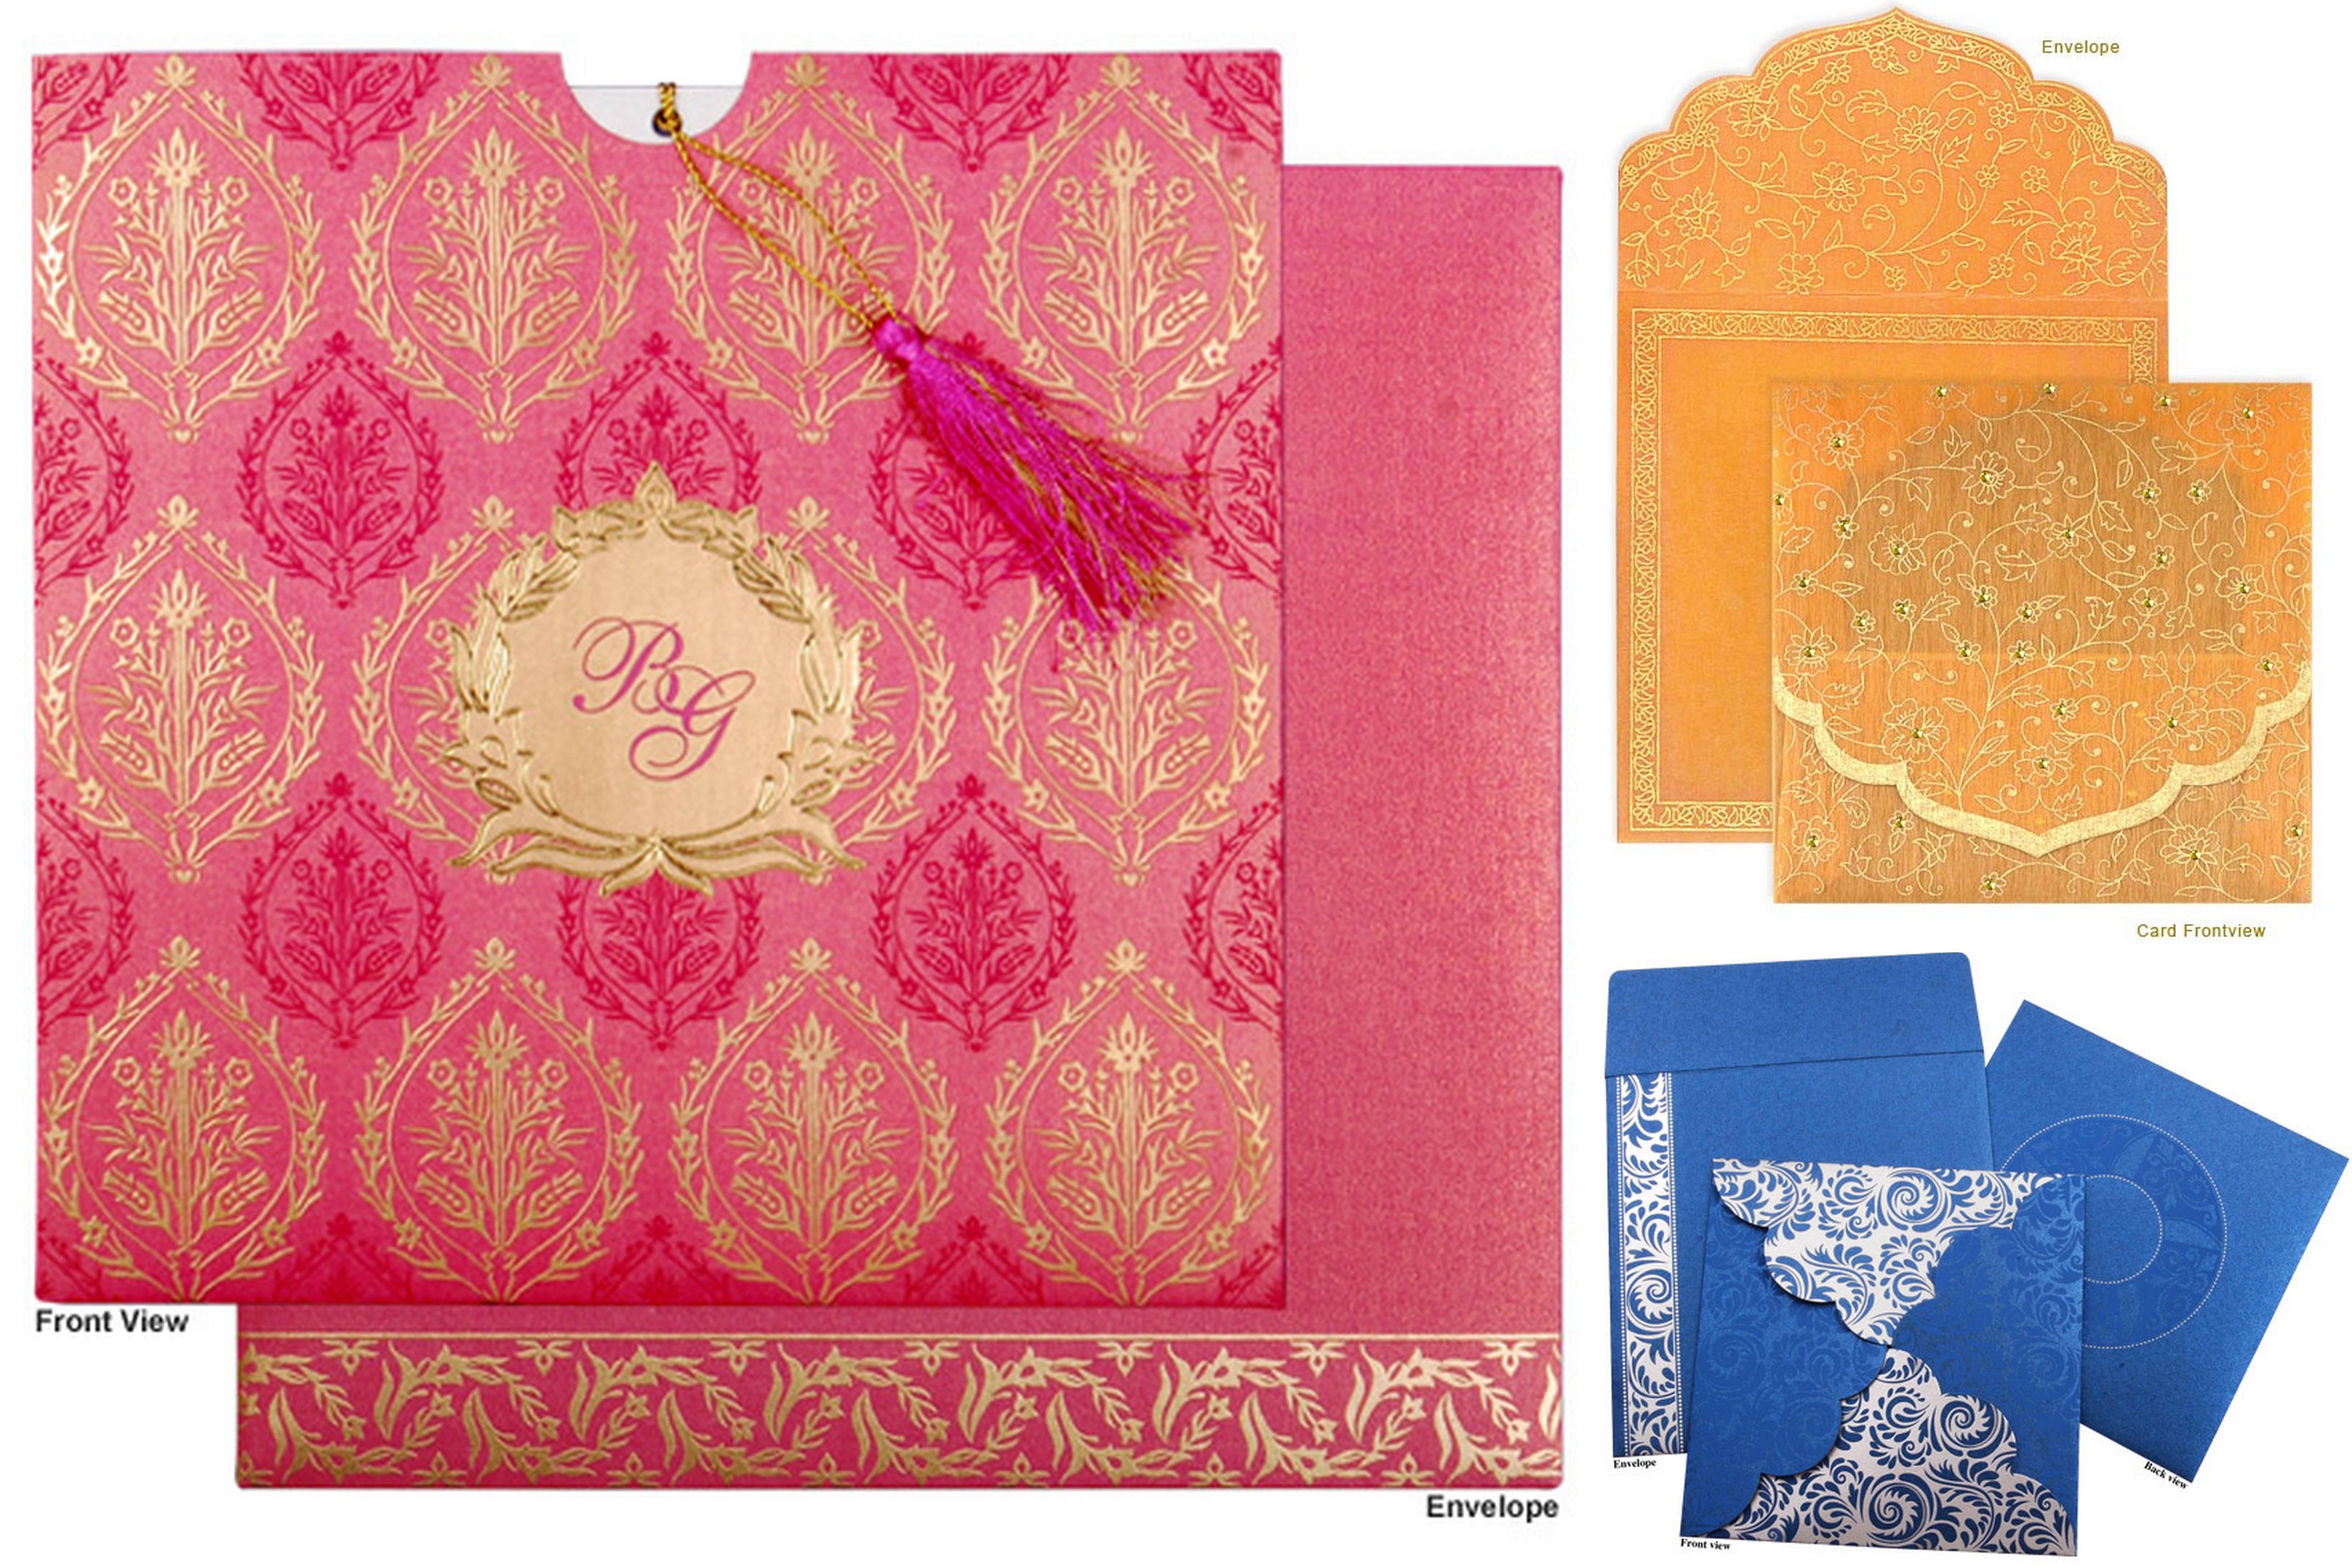 tips for wedding invitation cards wedding cards a2zweddingcards - Wedding Invitation Cards Online